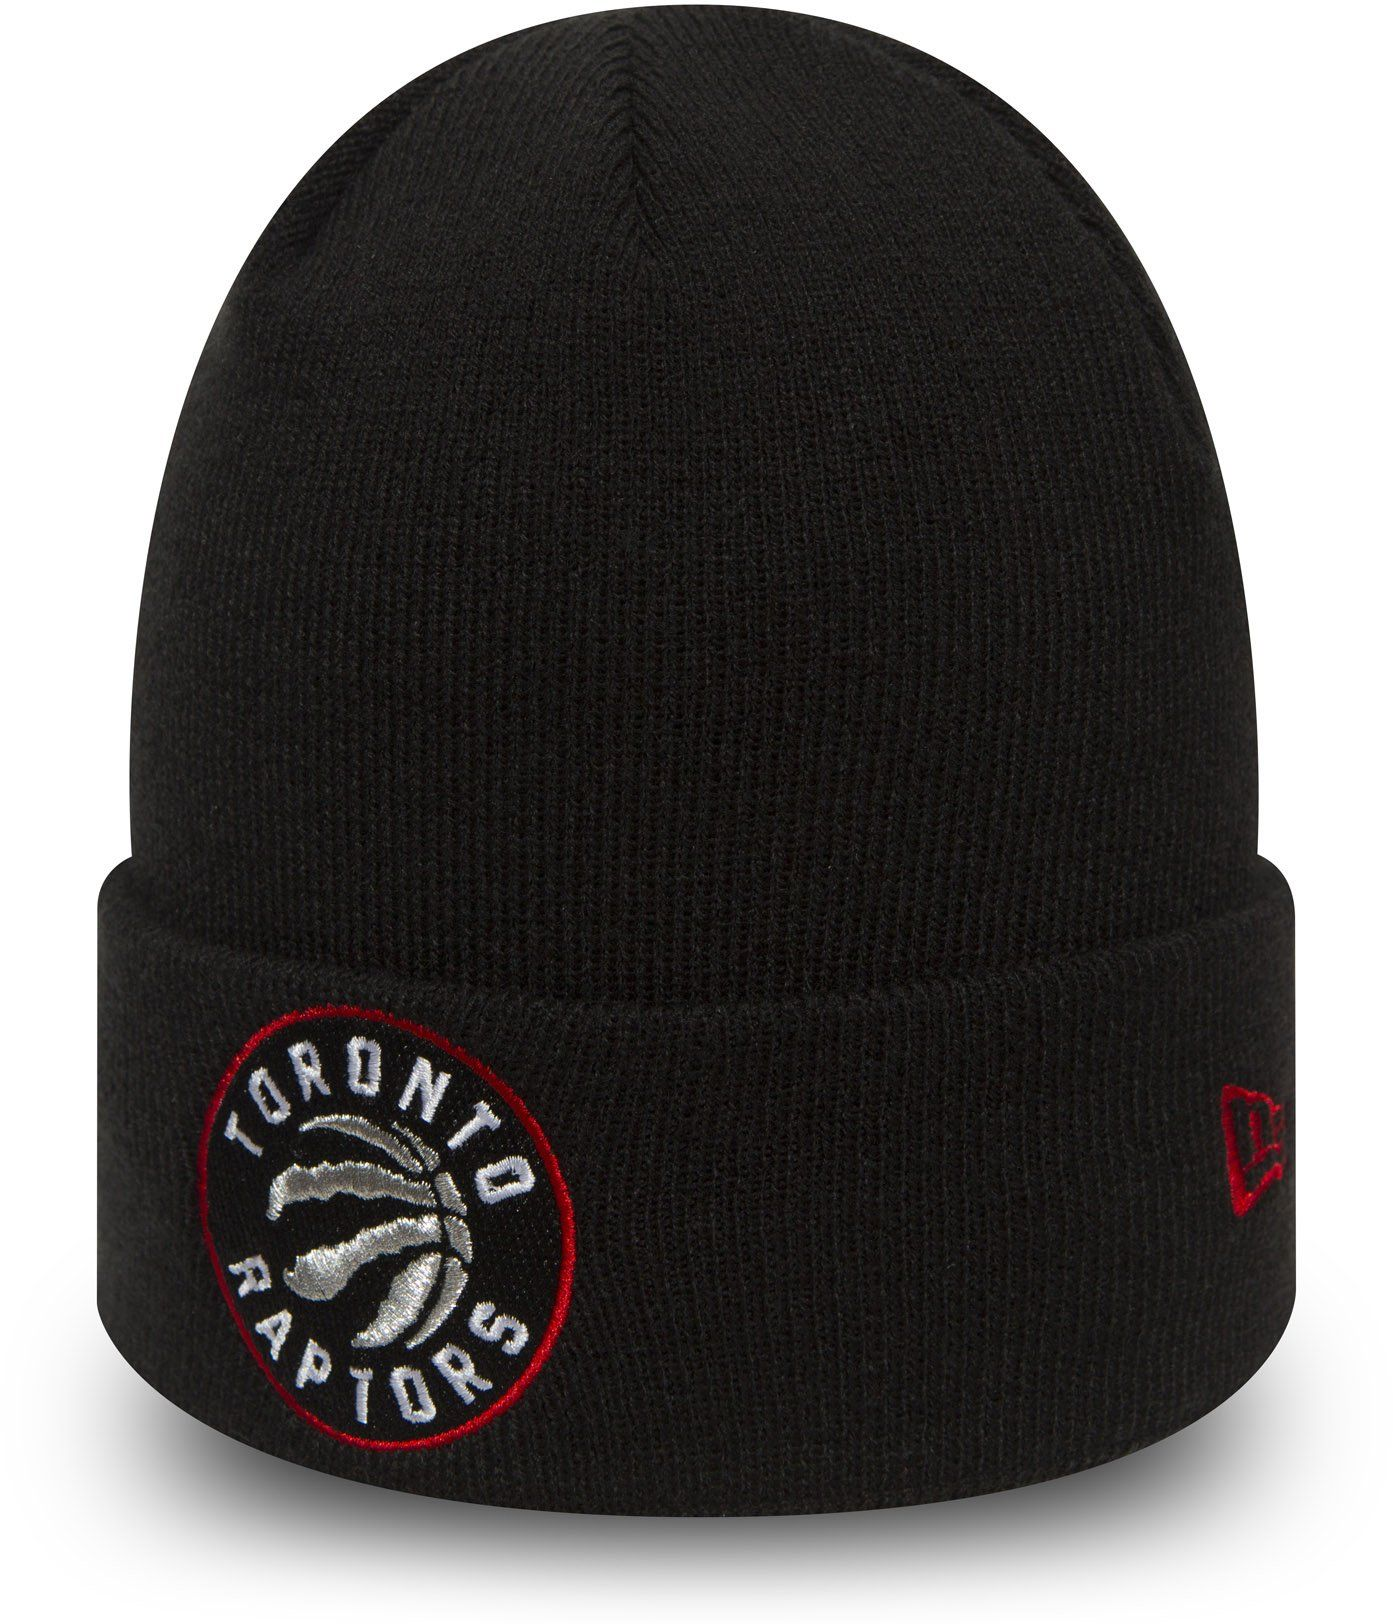 95c71cbee77 Toronto Raptors New Era NBA Team Essential Cuff Knit Beanie – lovemycap